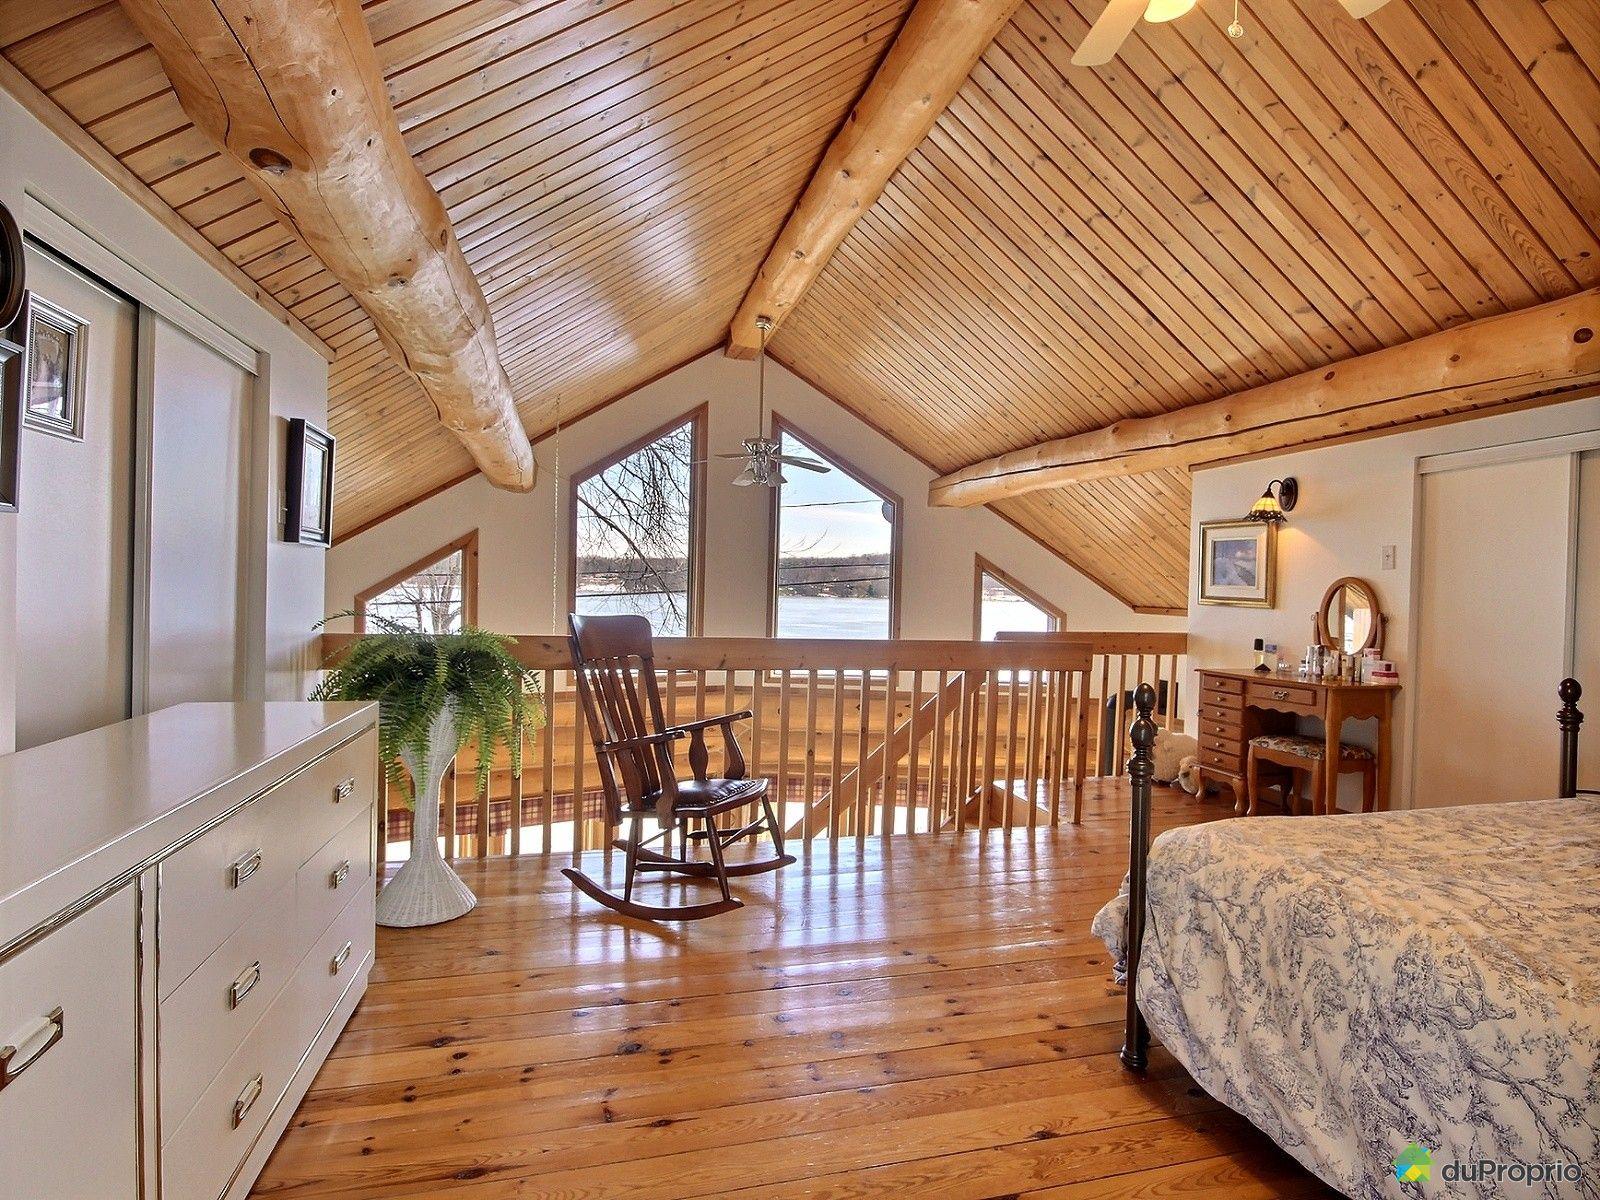 maison vendre masson angers 137 chemin du fer cheval. Black Bedroom Furniture Sets. Home Design Ideas